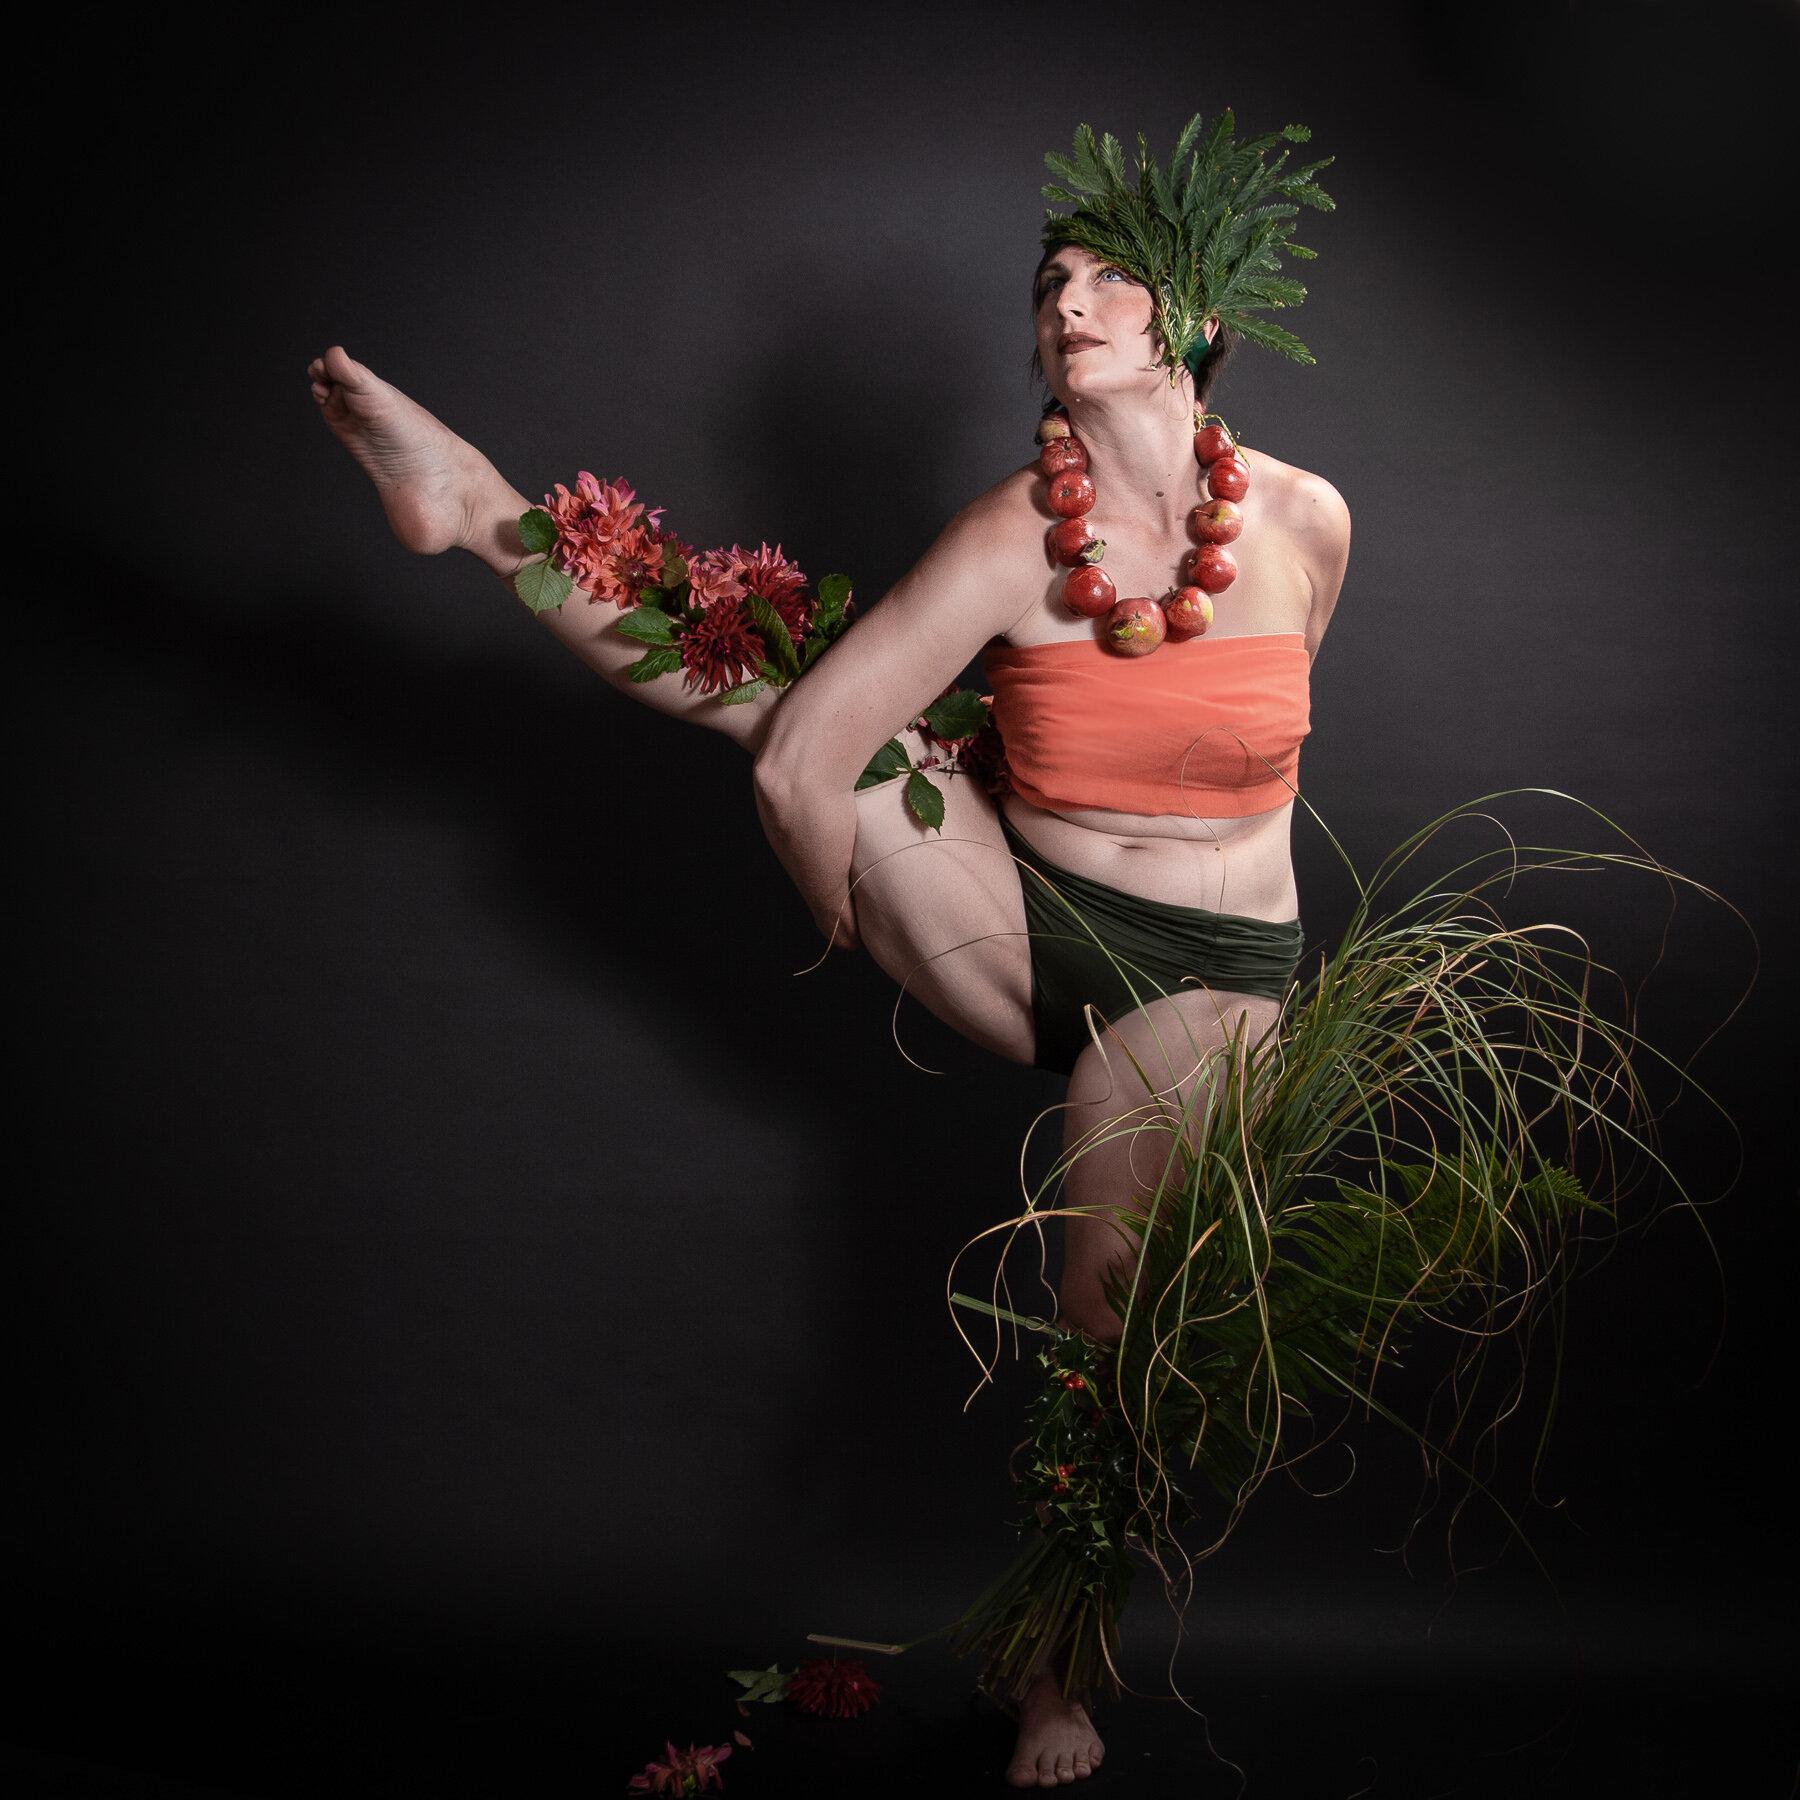 Bird-Of-Pacific-Northwest-Paradise-Self-Portrait-By-Bonnie-Obremski.jpg